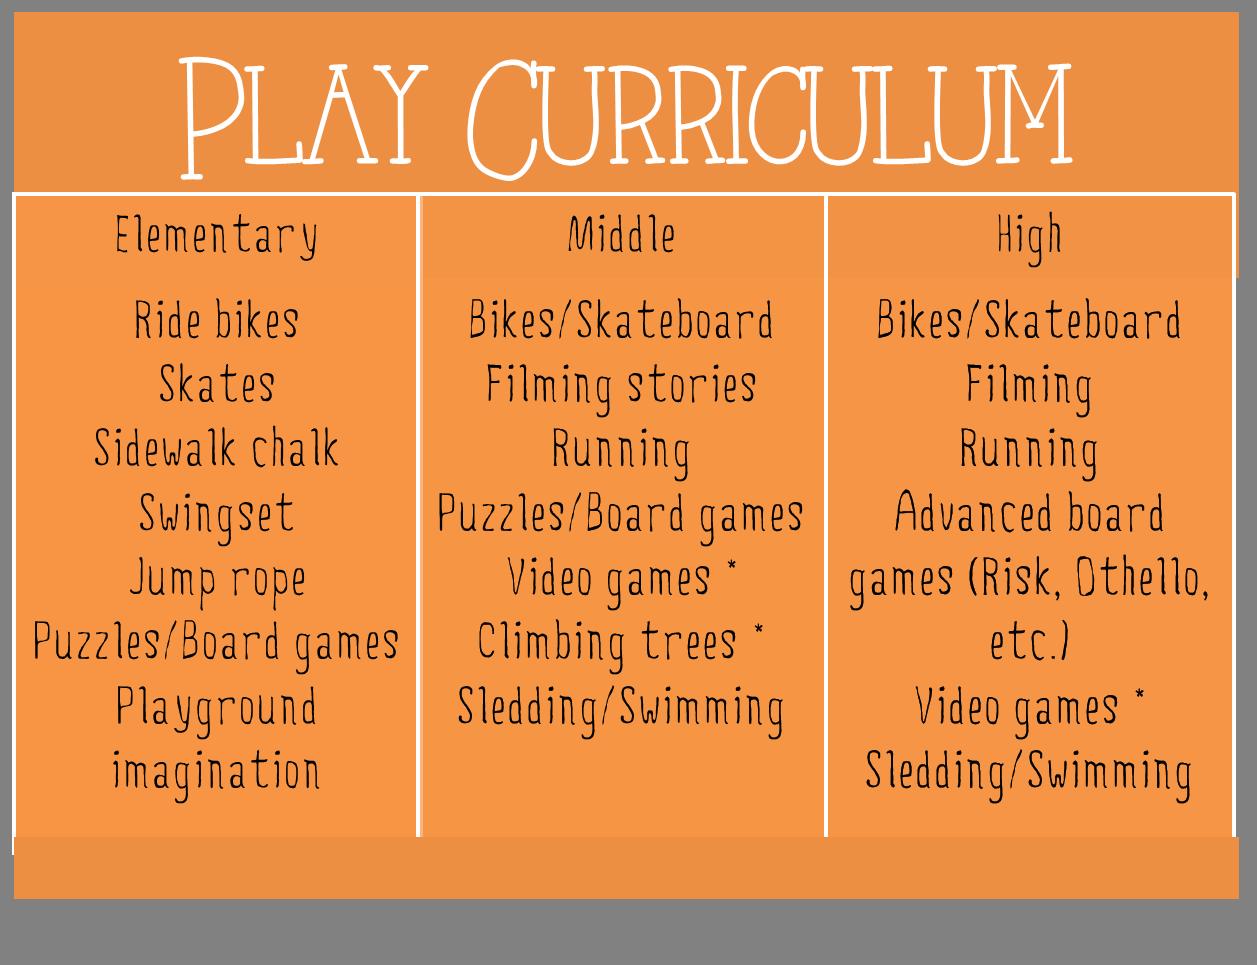 Play Curriculum